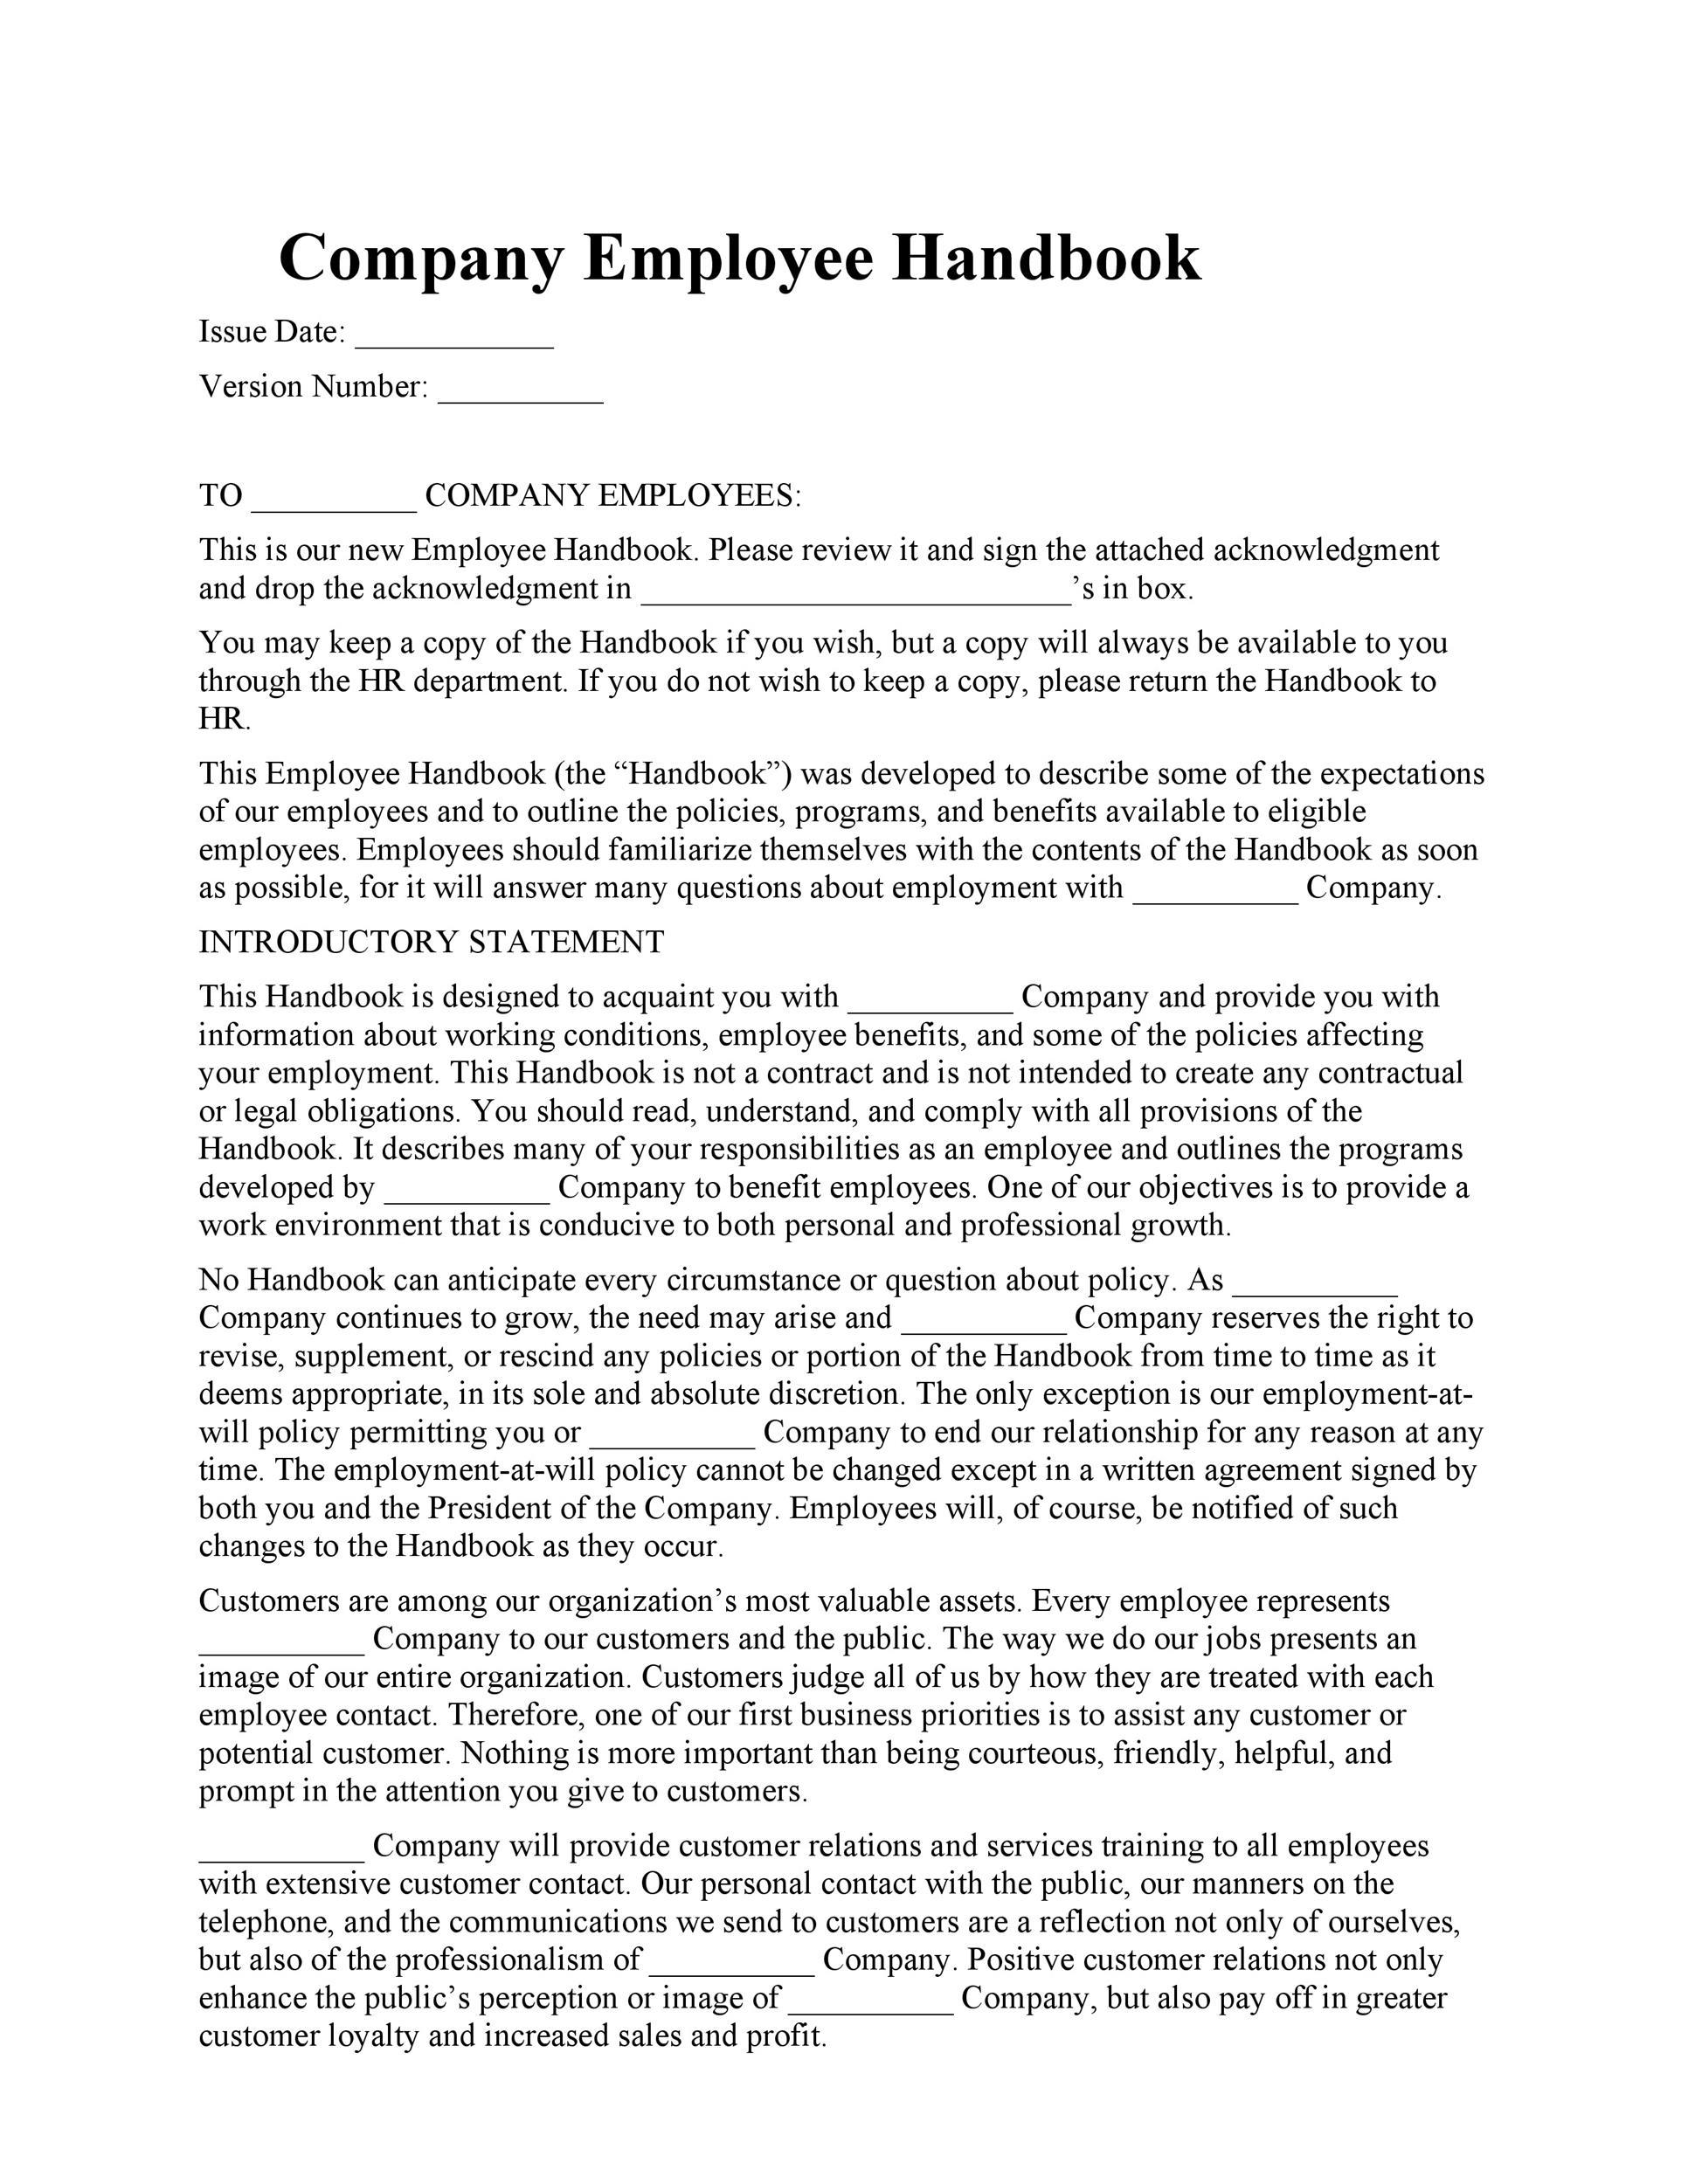 Free employee handbook template 23